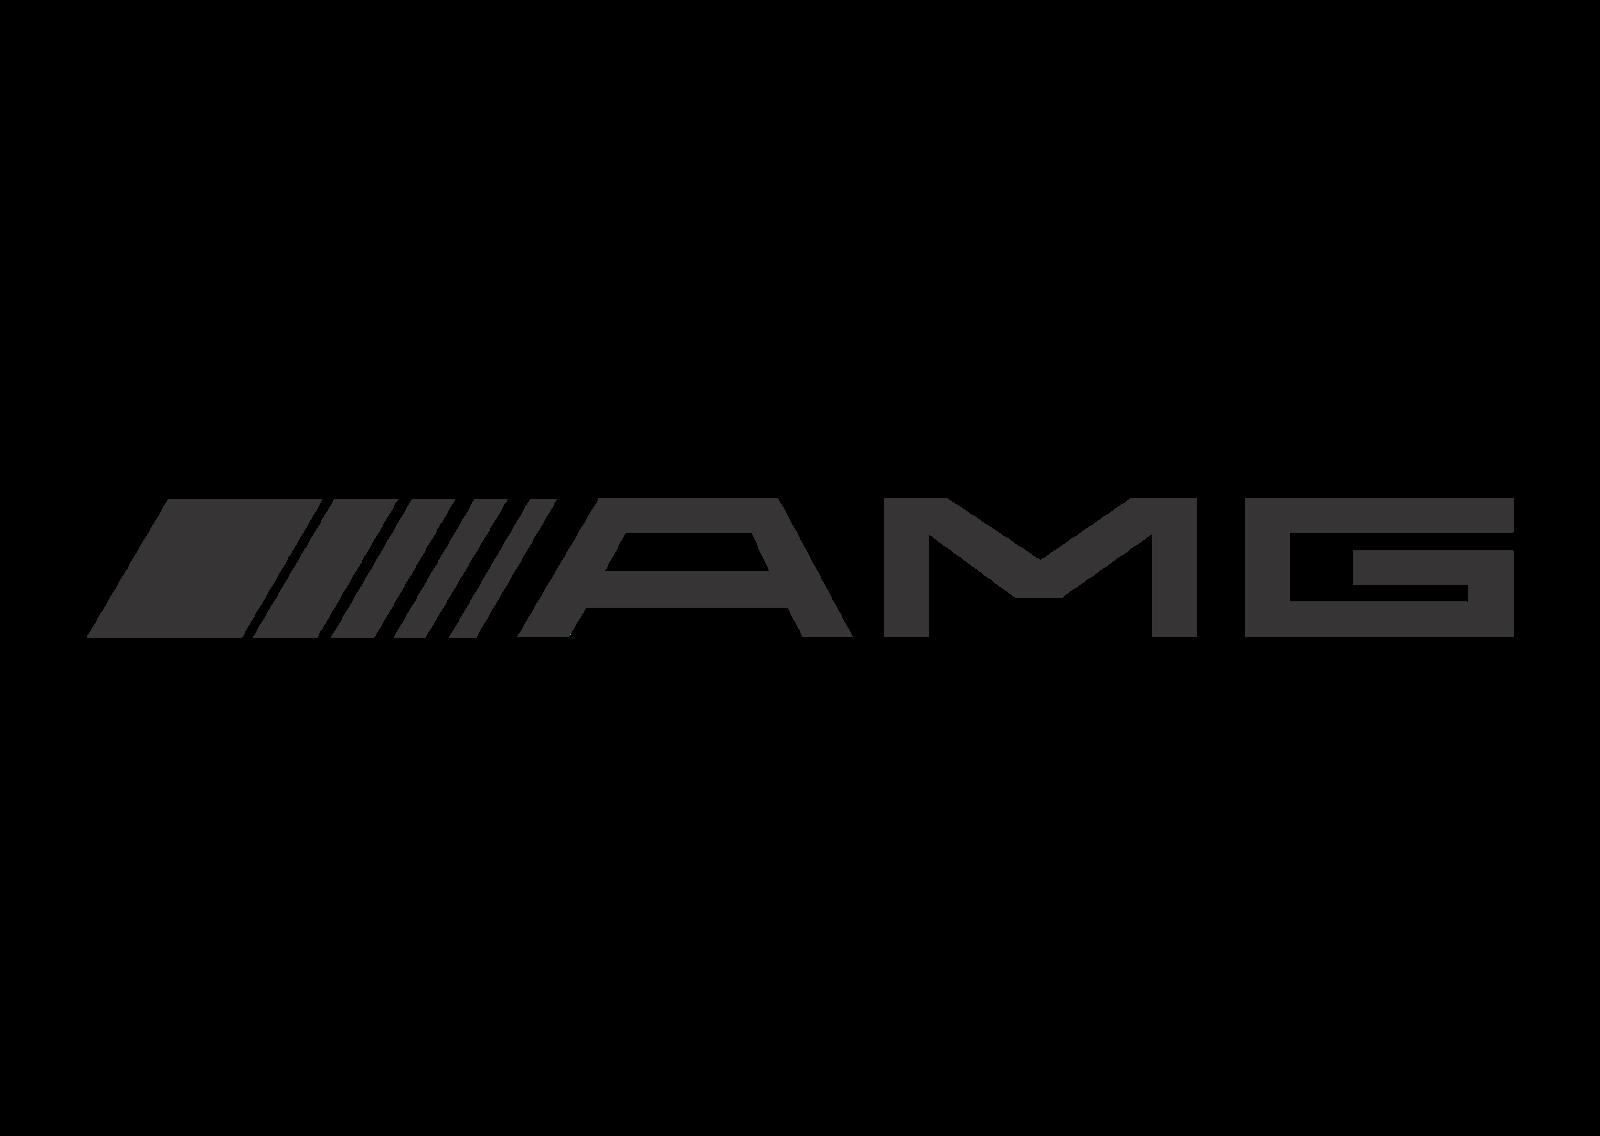 amg logo vector vehicle manufacturer see more mercedes benz - Mercedes Benz Logo Vector